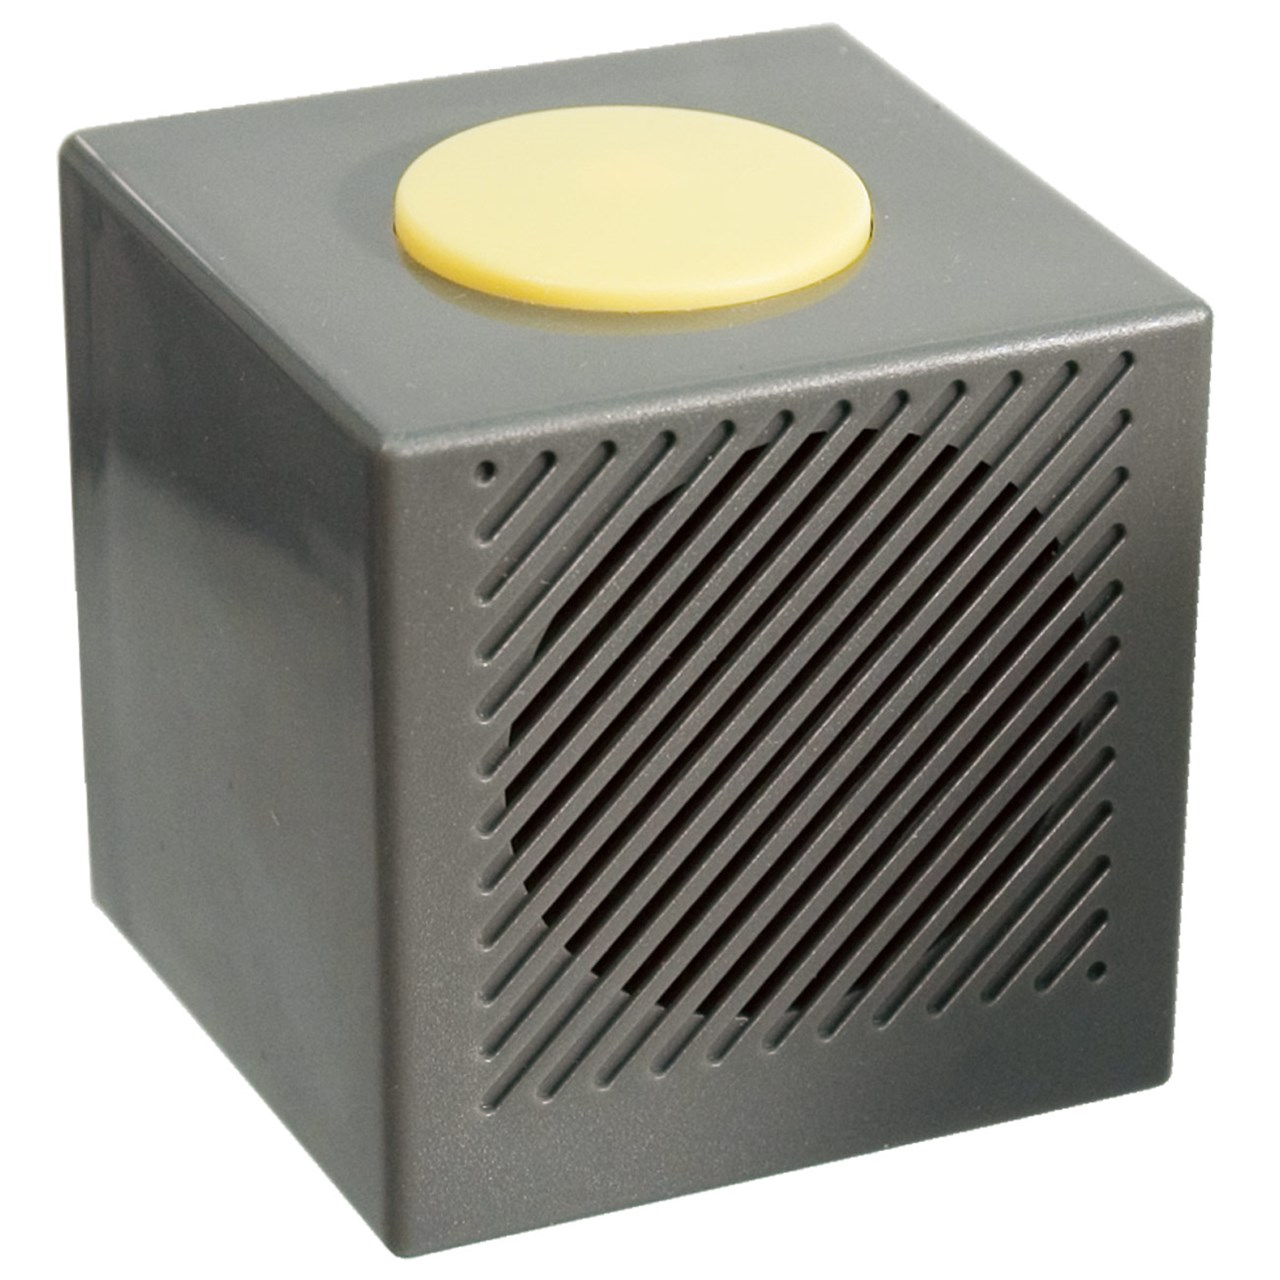 maxiaids  talking cube clock - talking cube clock